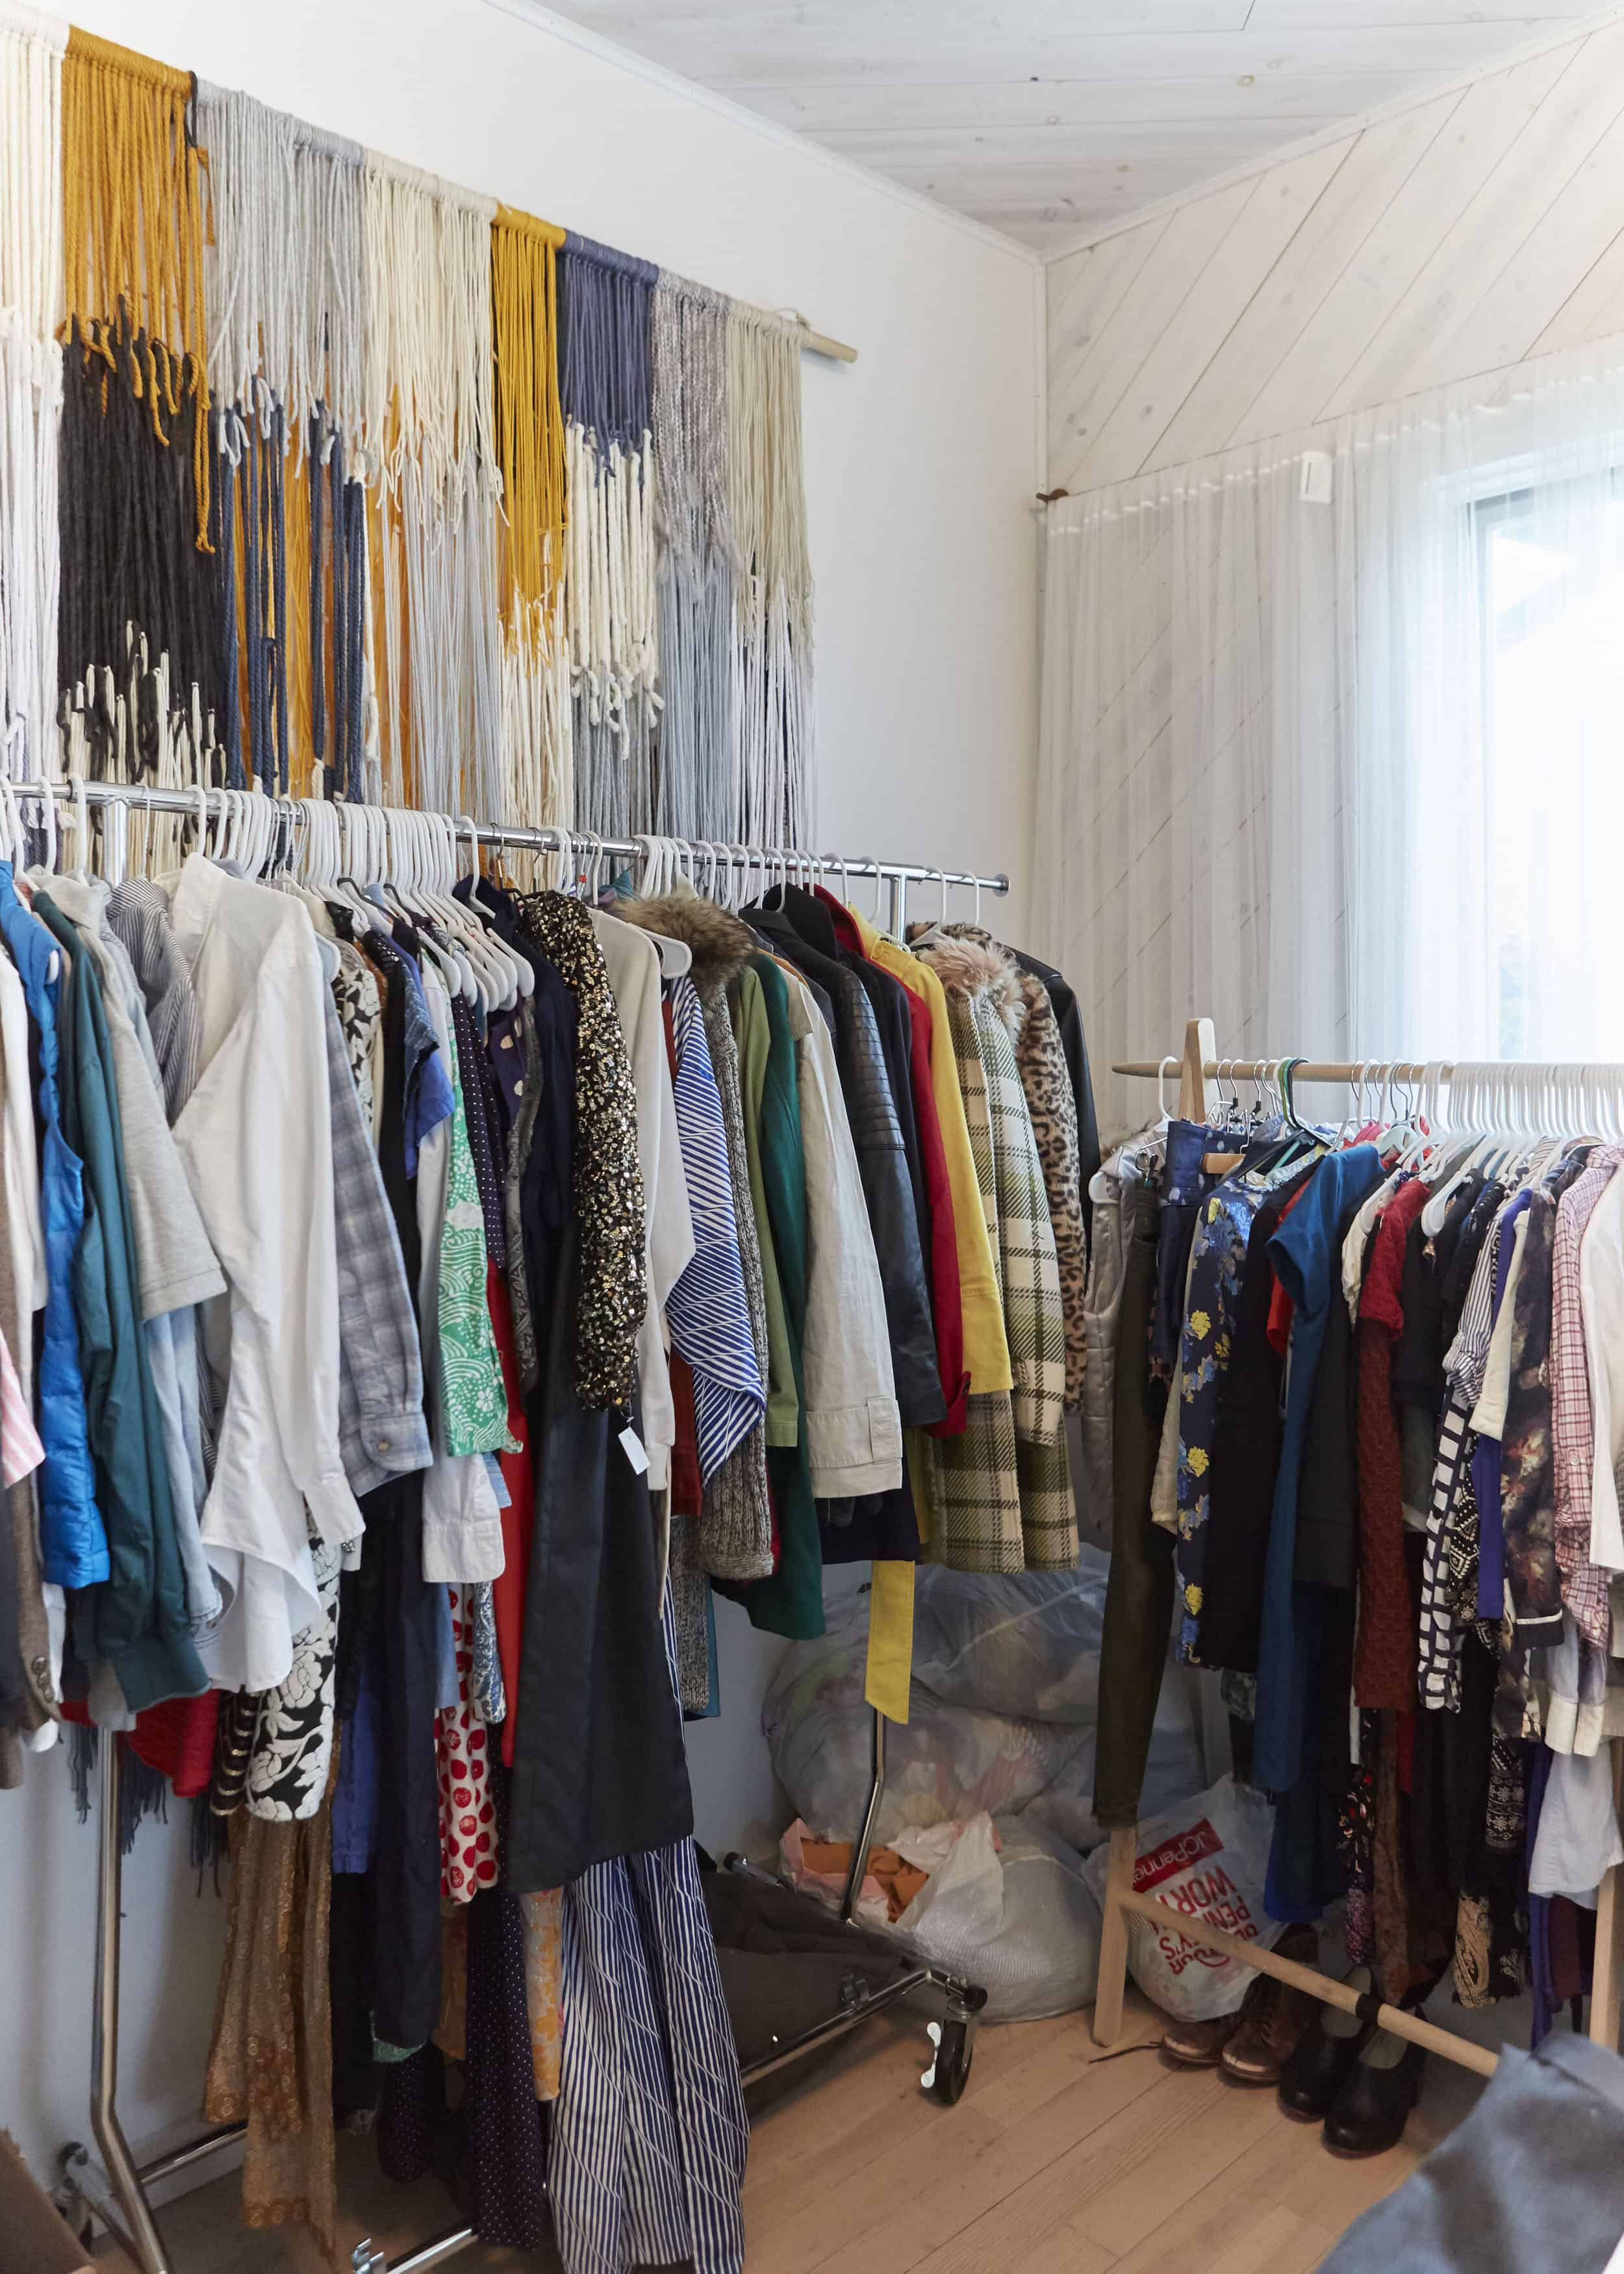 Sale Yarn Wall Art The Ruby Street Clothing On Racks